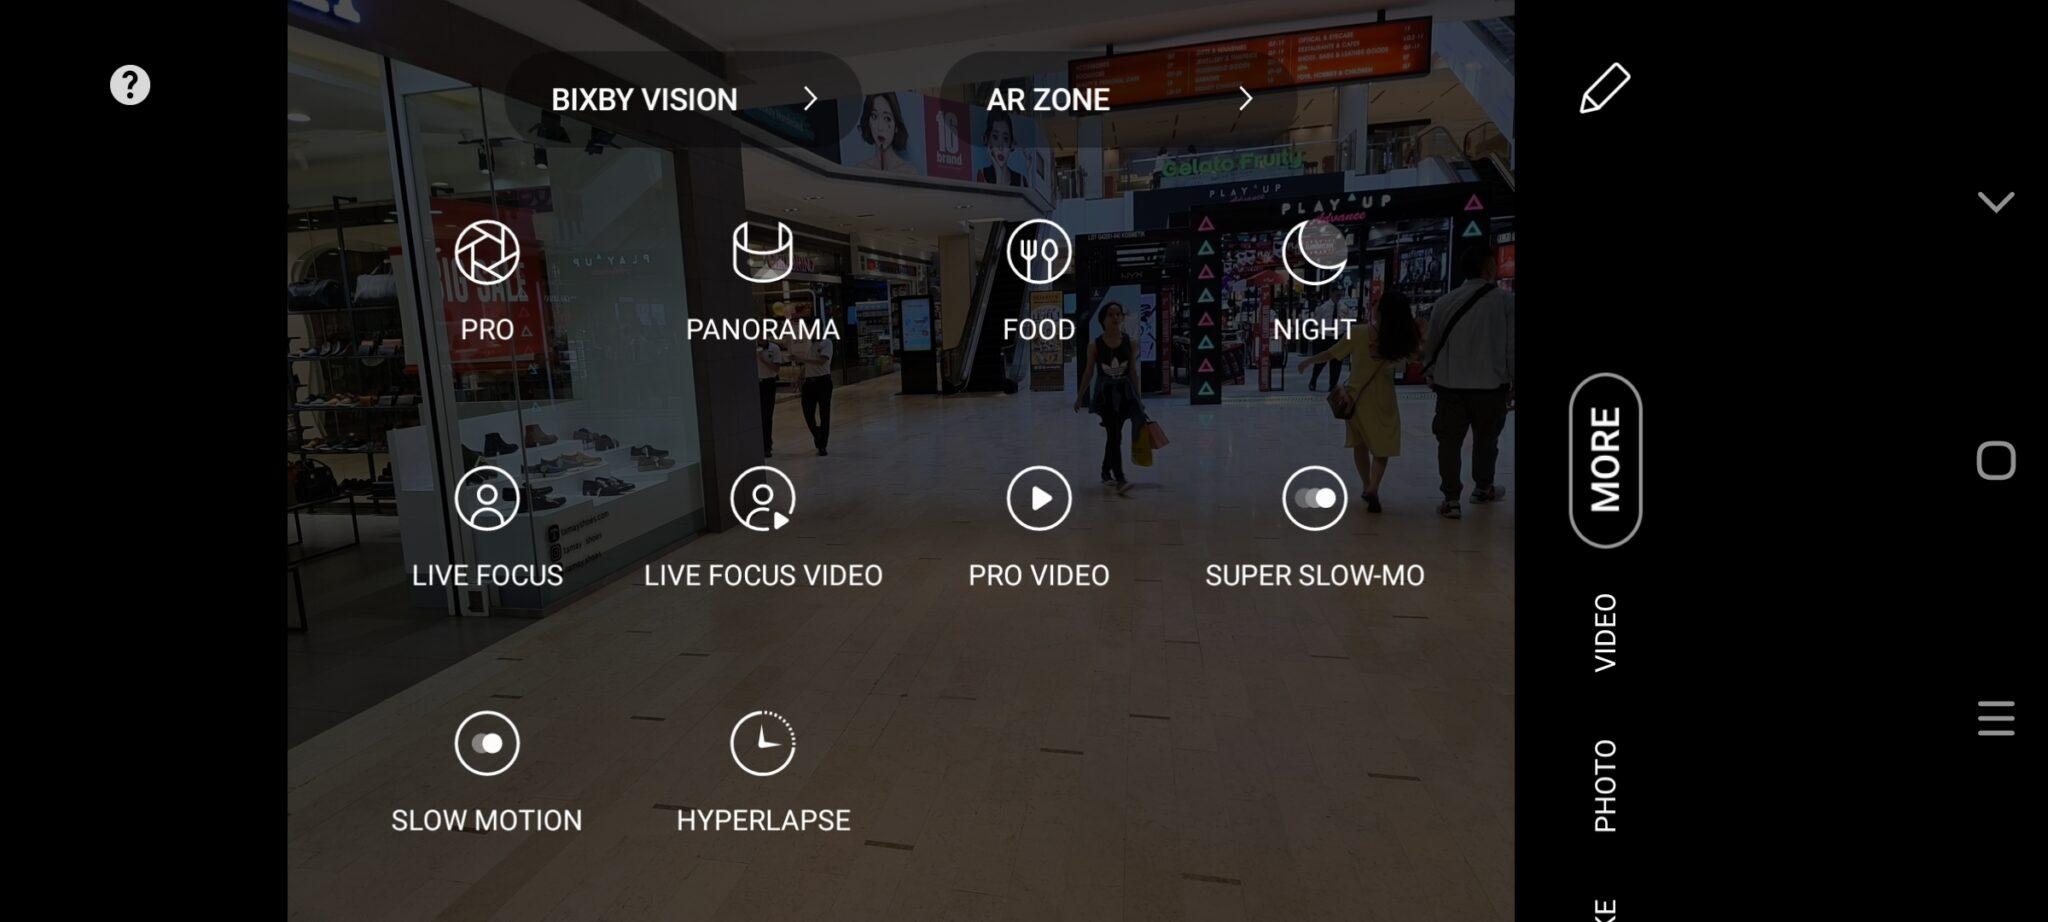 Galaxy S20 Ultra camera UI